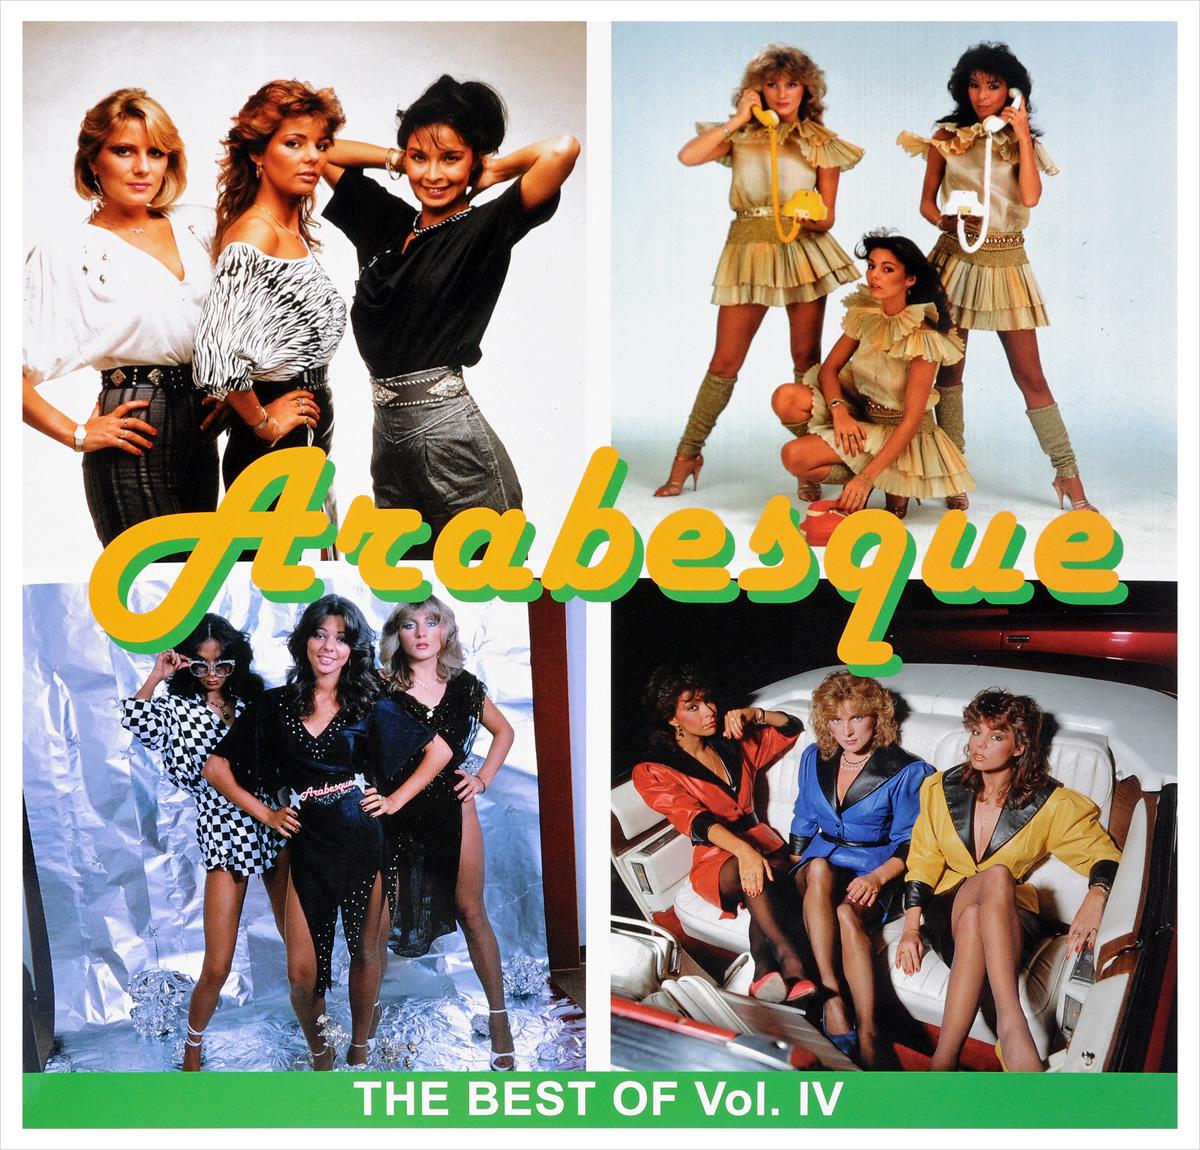 цена на Arabesque Arabesque. The Best Of Vol.IV (LP)